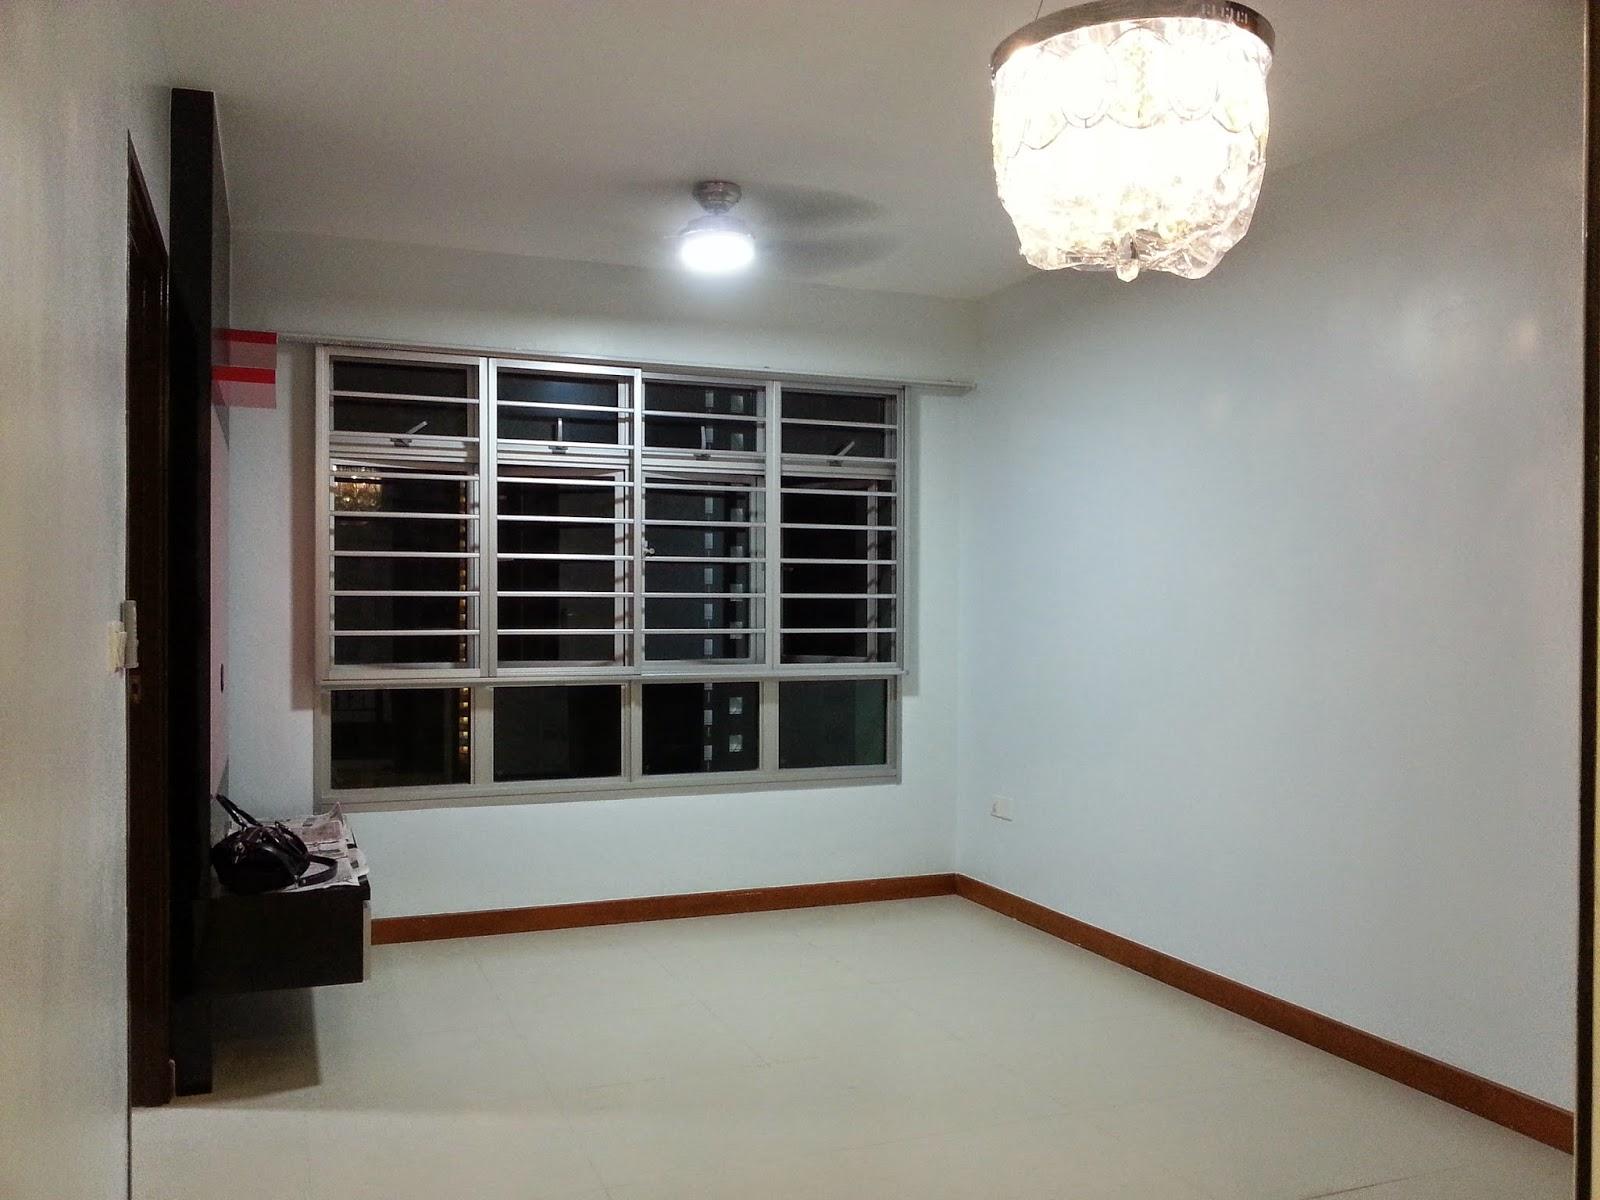 2 Room Bto Renovation Affordable Price 2 3 4 5 Room